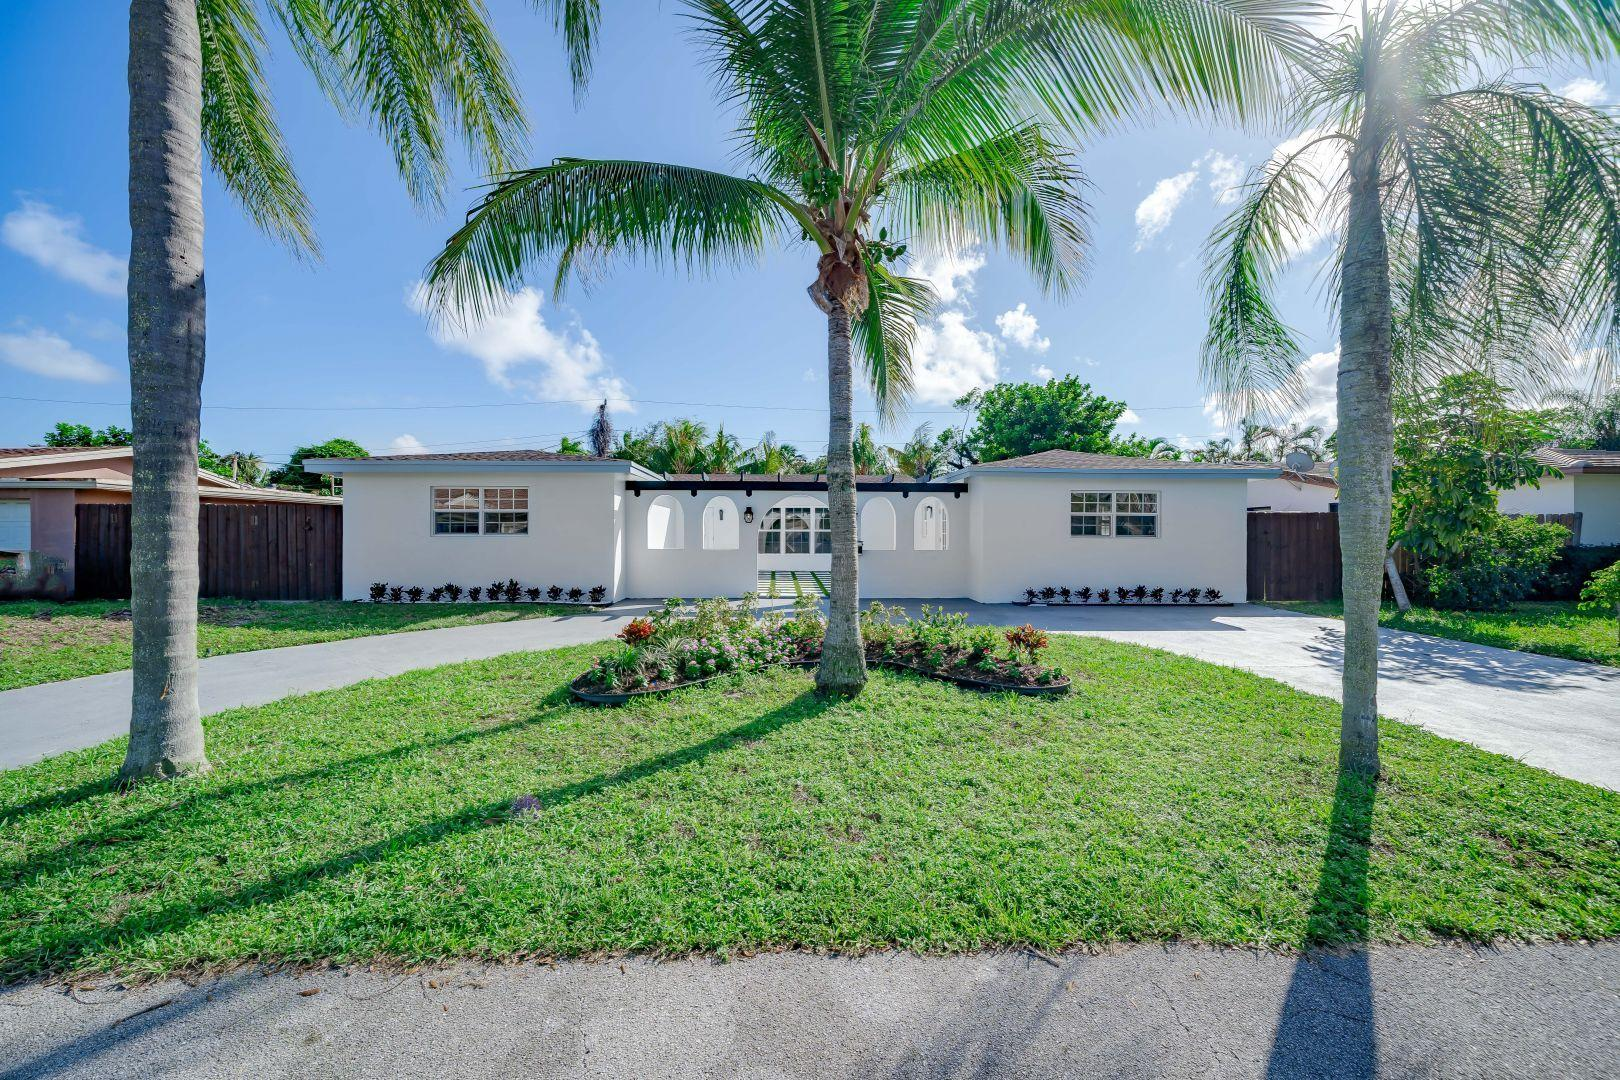 904 SE 13th Court, Deerfield Beach, FL 33441